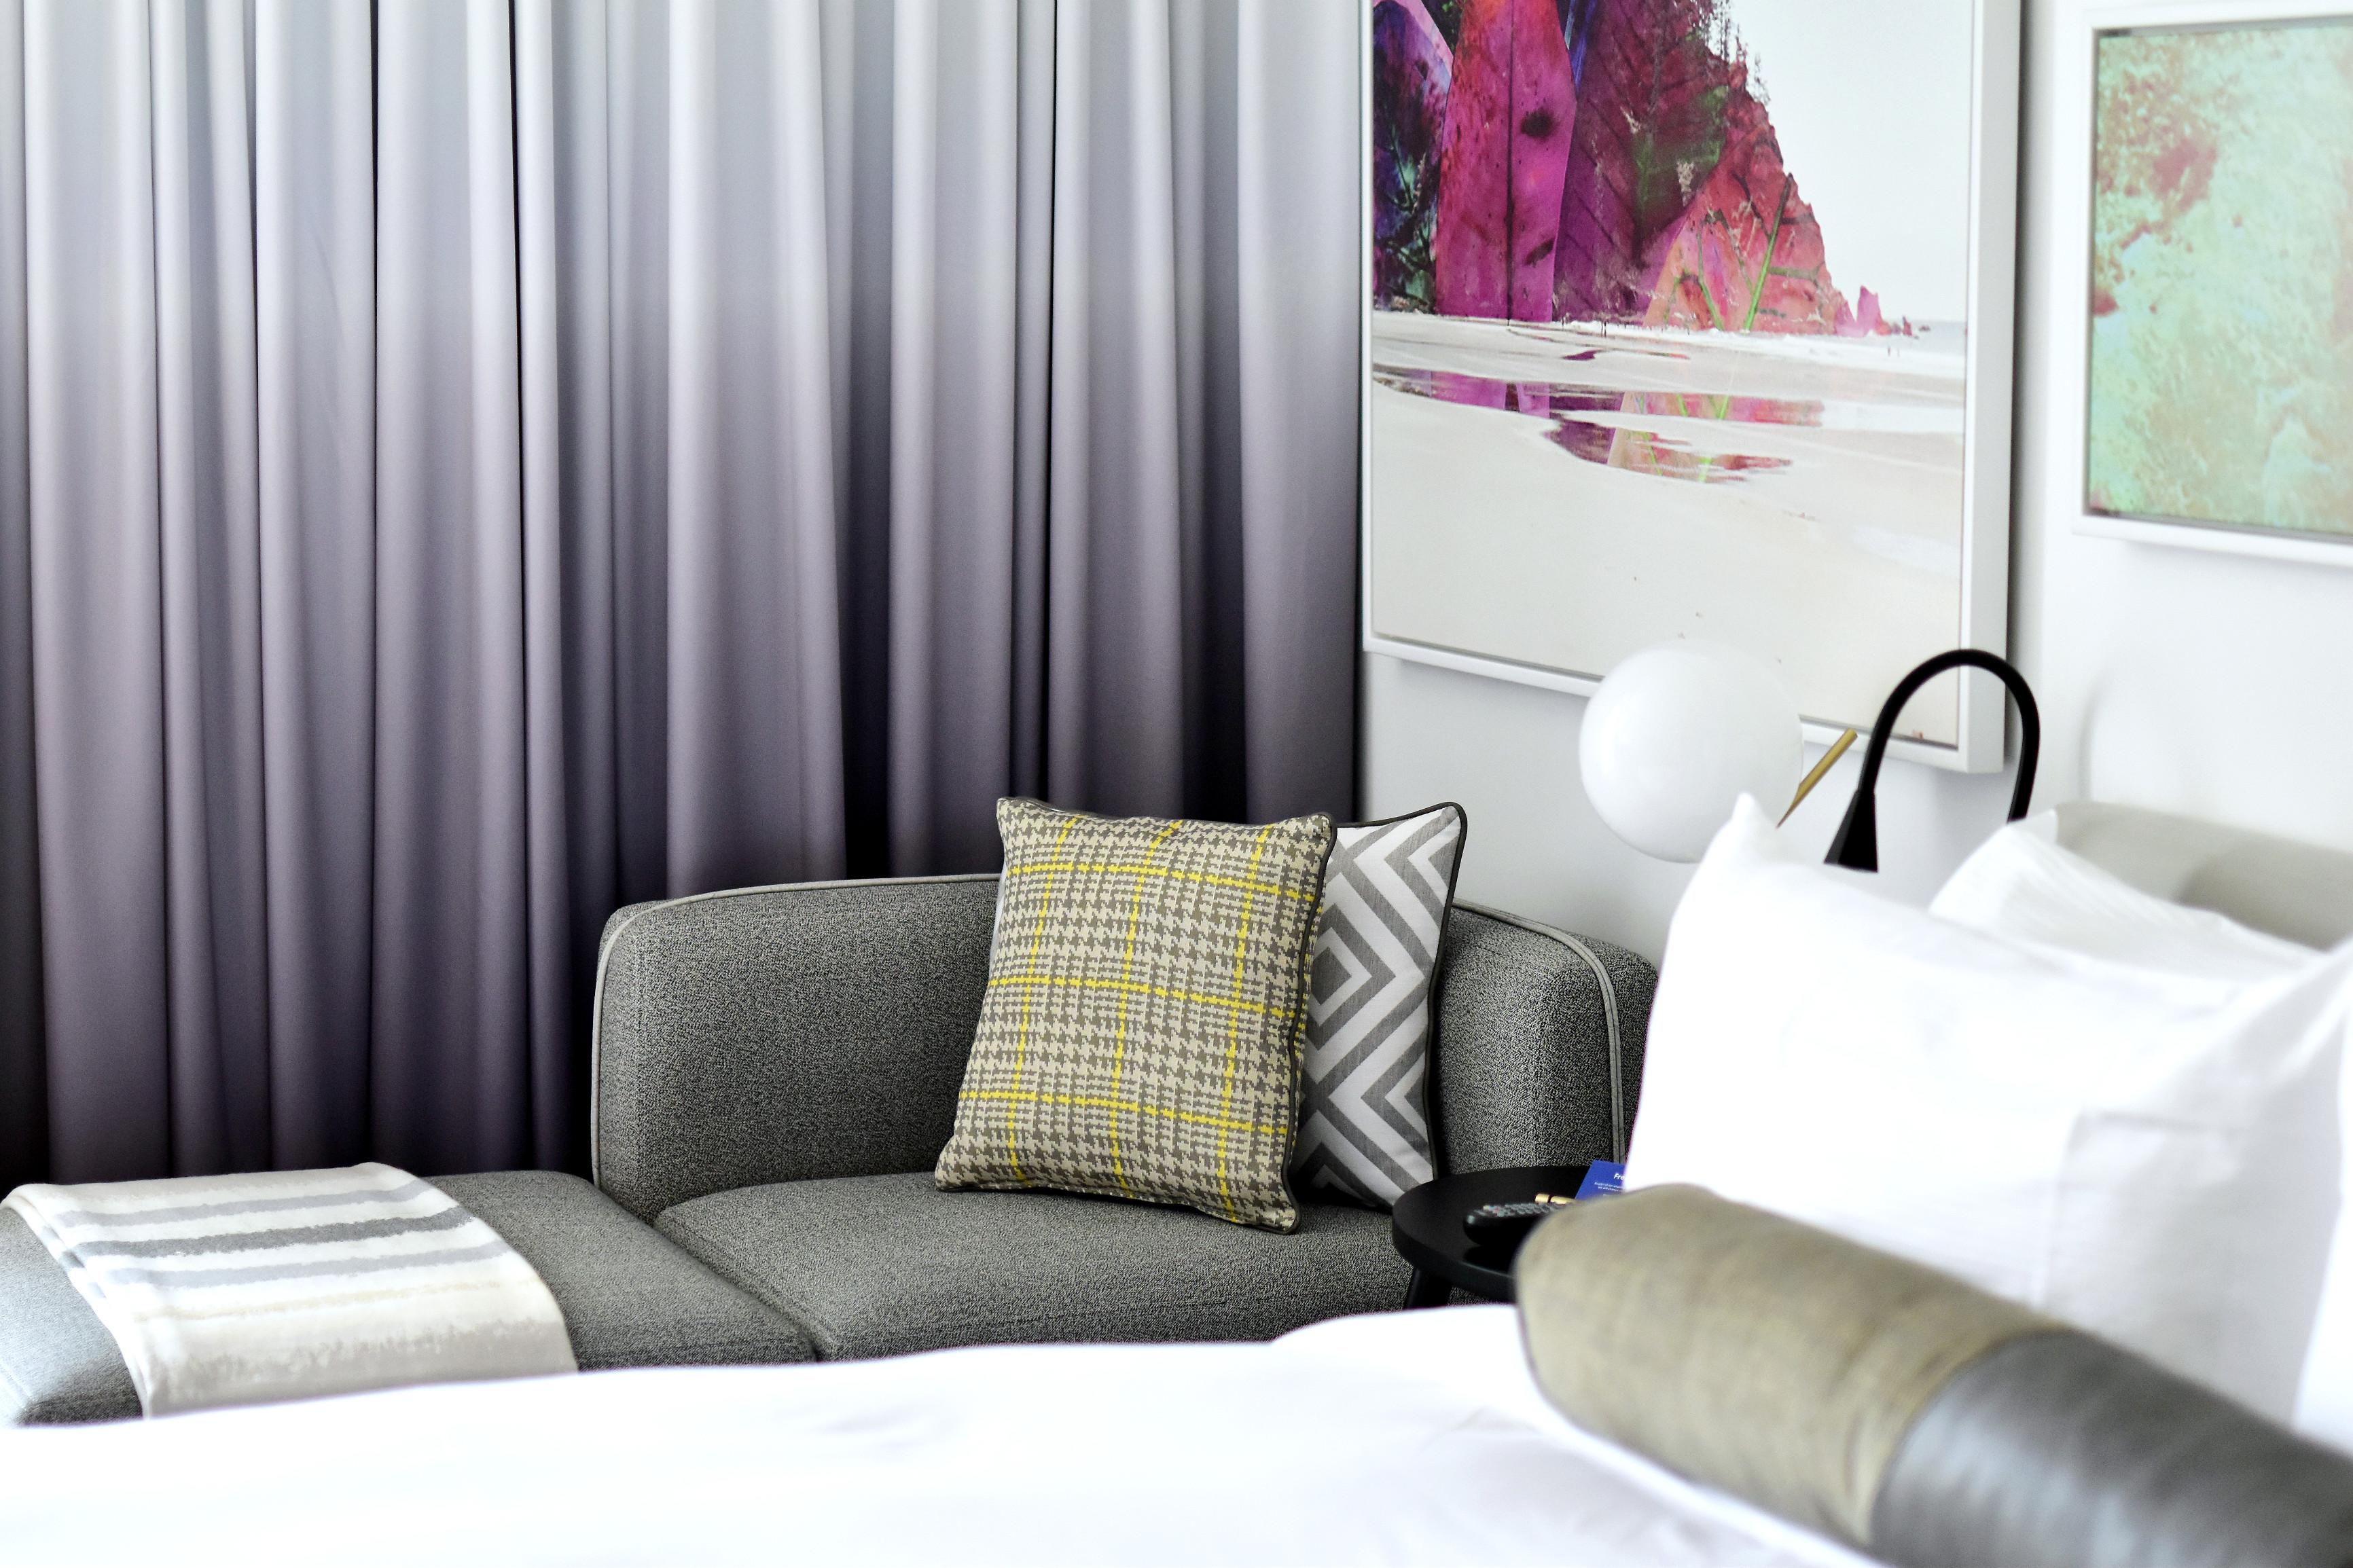 tommeezjerry-maennermodeblog-maennermode-berlinblog-fashionblog-travelblog-new-york-the-william-vale-hotel-travel-reisen